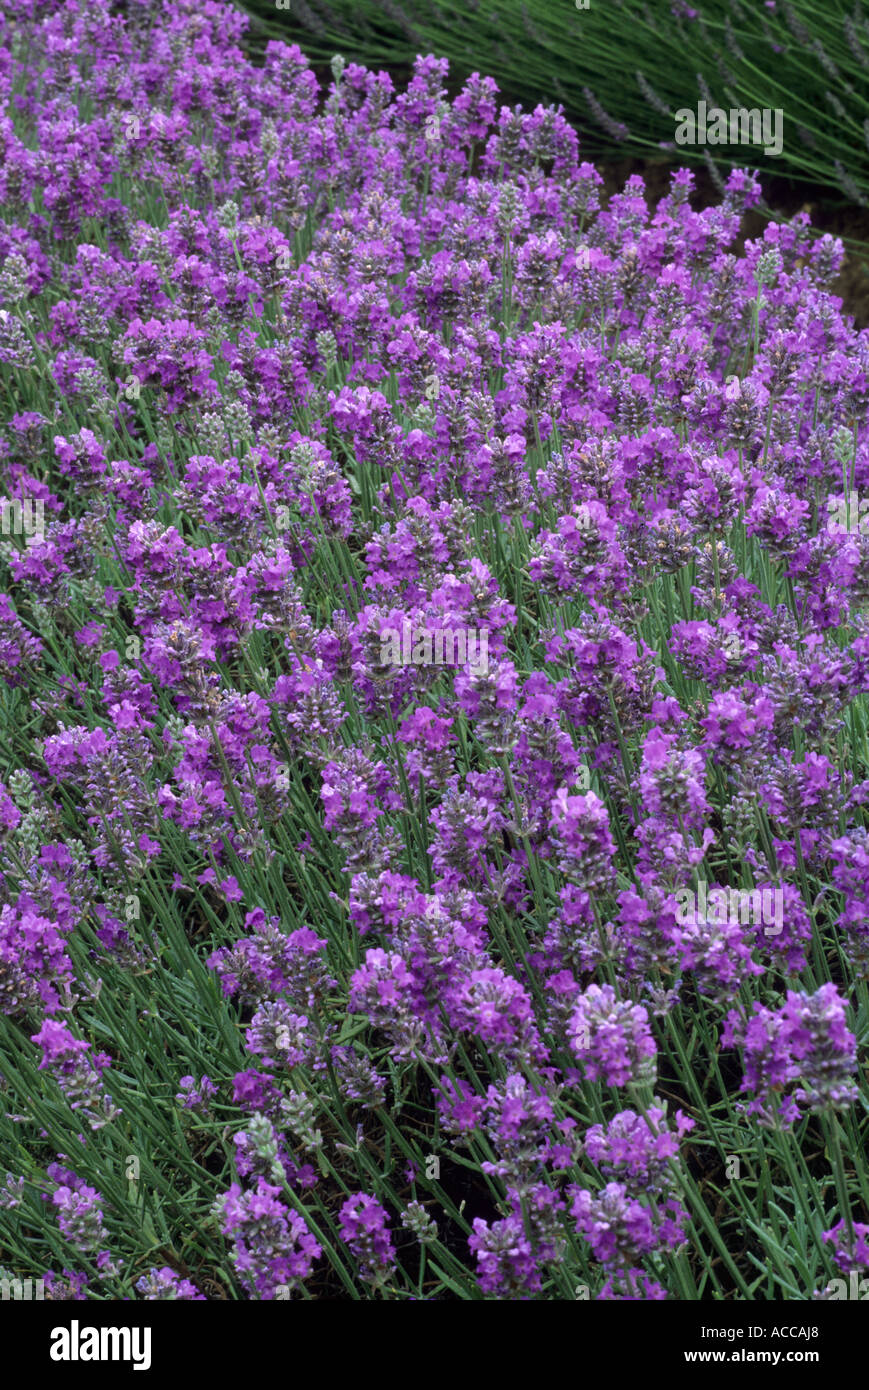 Lavandula Angustifolia U0027Irene Doyleu0027, Lavender, Aromatic Scented Garden  Plant Flower, Lavenders